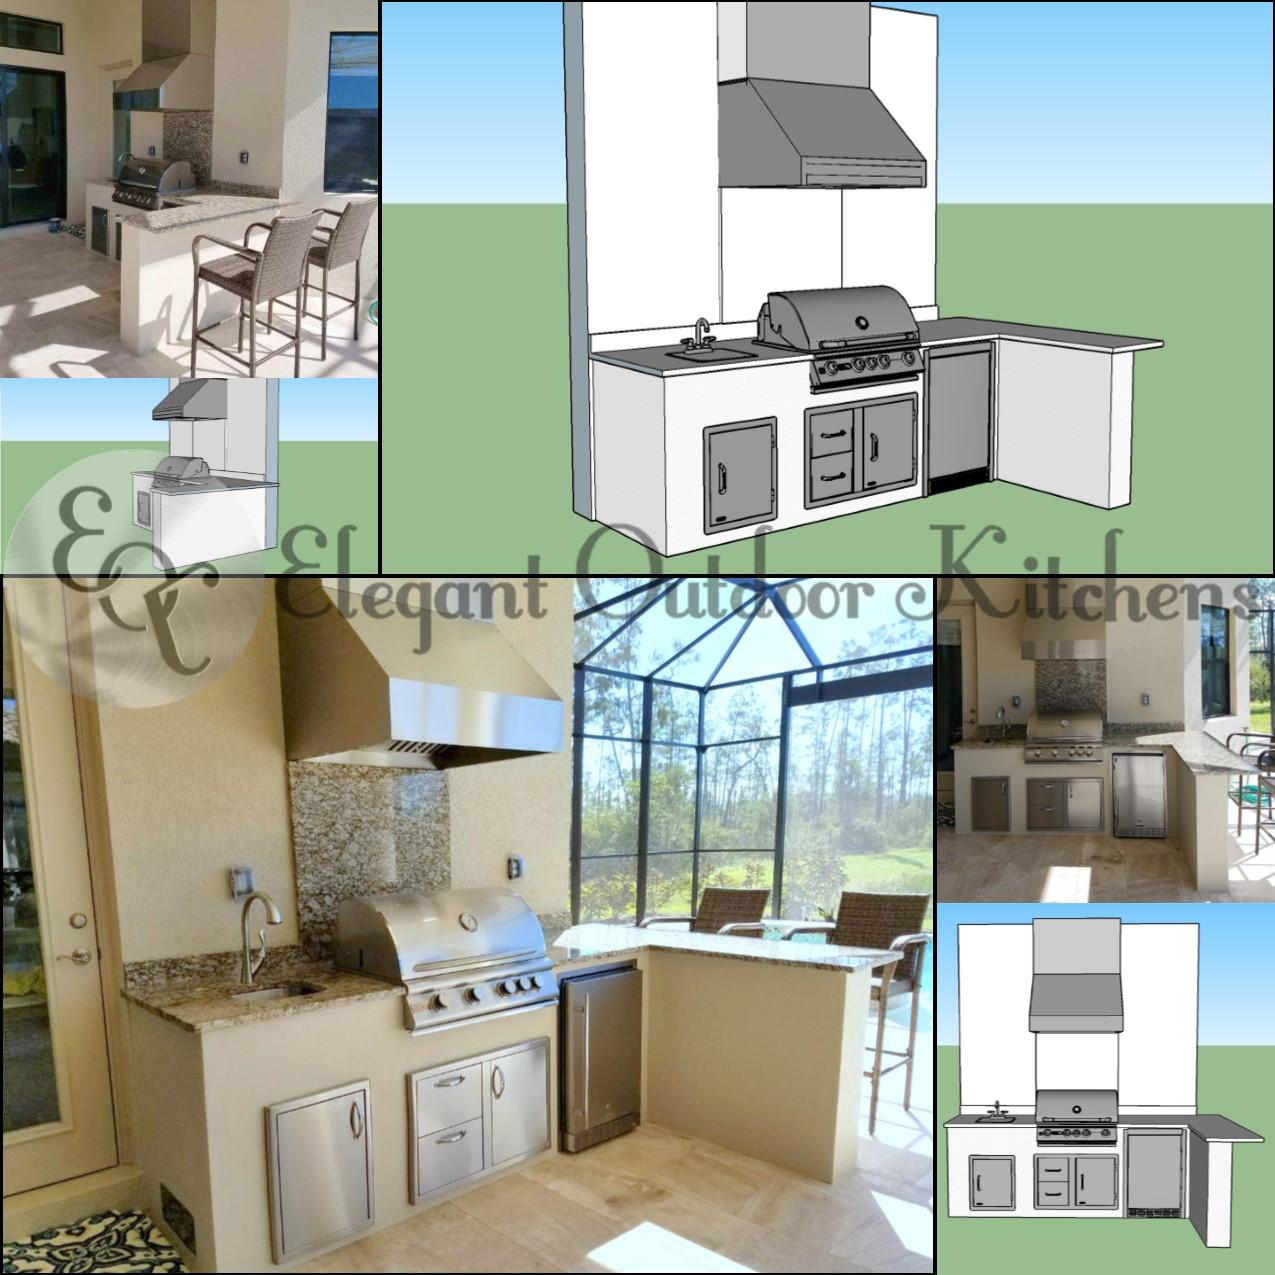 Outdoor Kitchens Sydney Custom Alfresco Kitchen Designs: The Light & Dreamy Custom Outdoor Kitchen